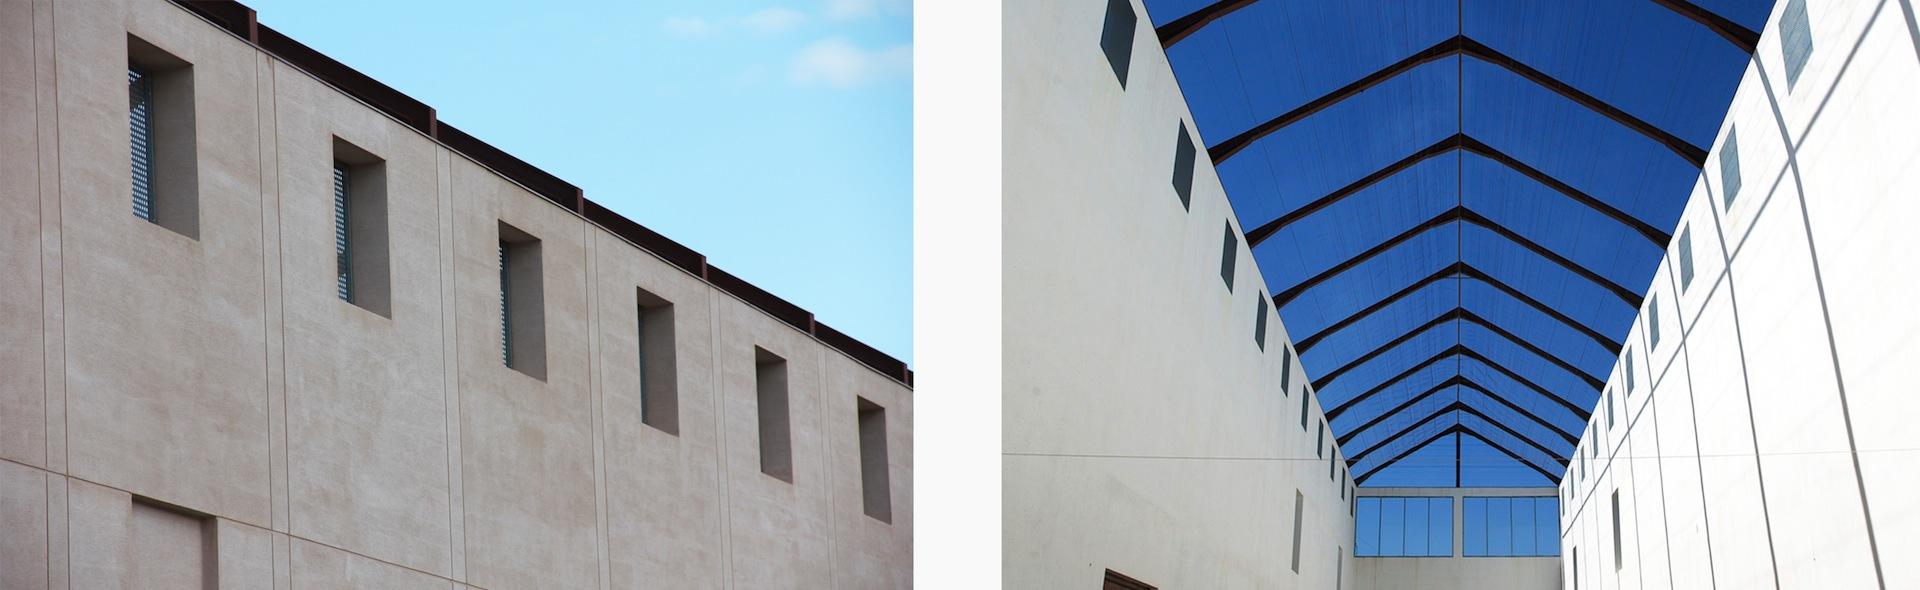 singularq-architecture-lab-arquitecture-pelota-valenciana